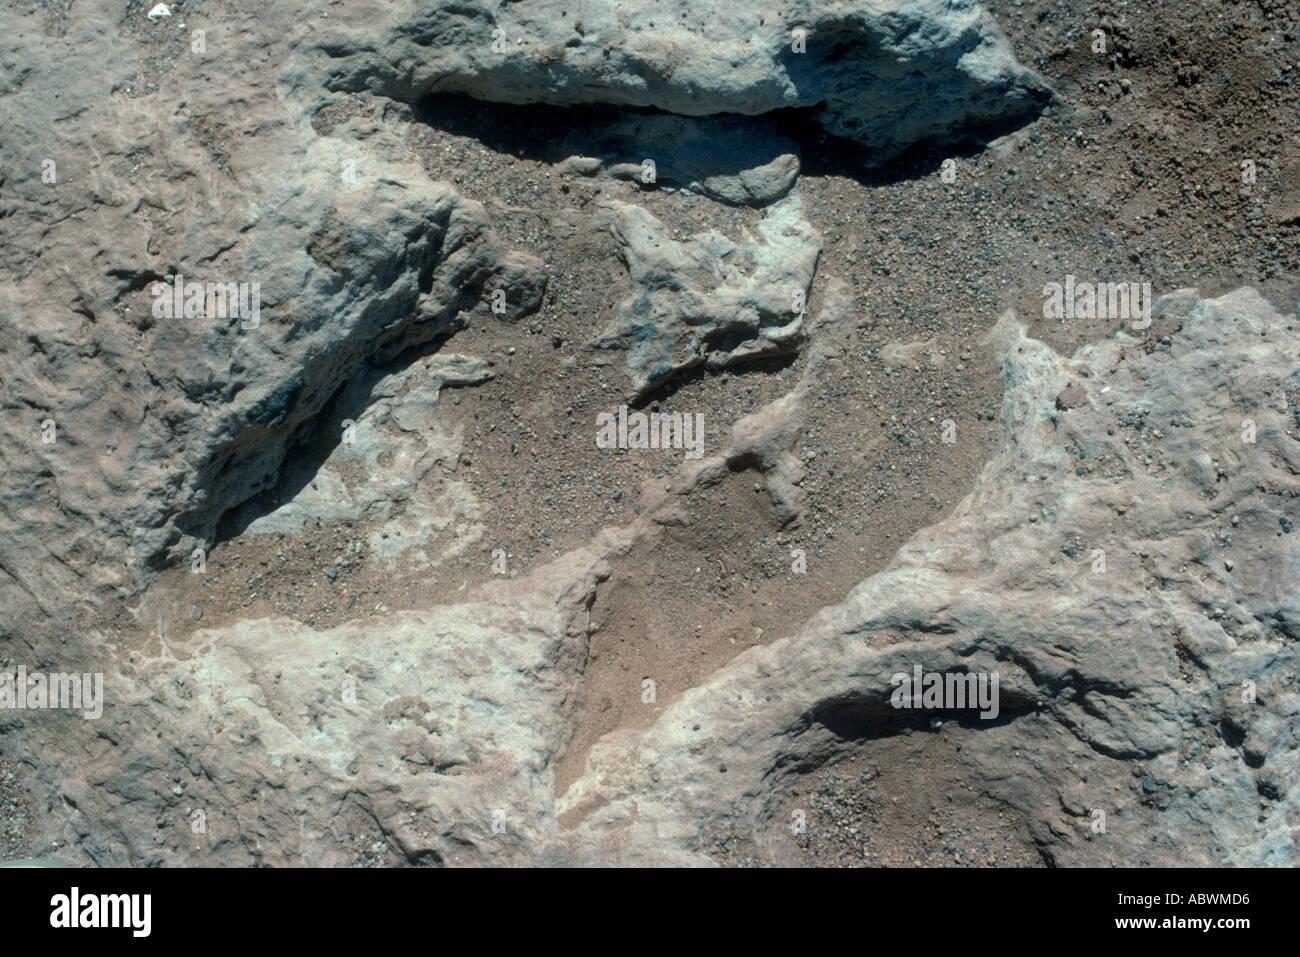 Dinosaur footprint, North Arizona, USA - Stock Image